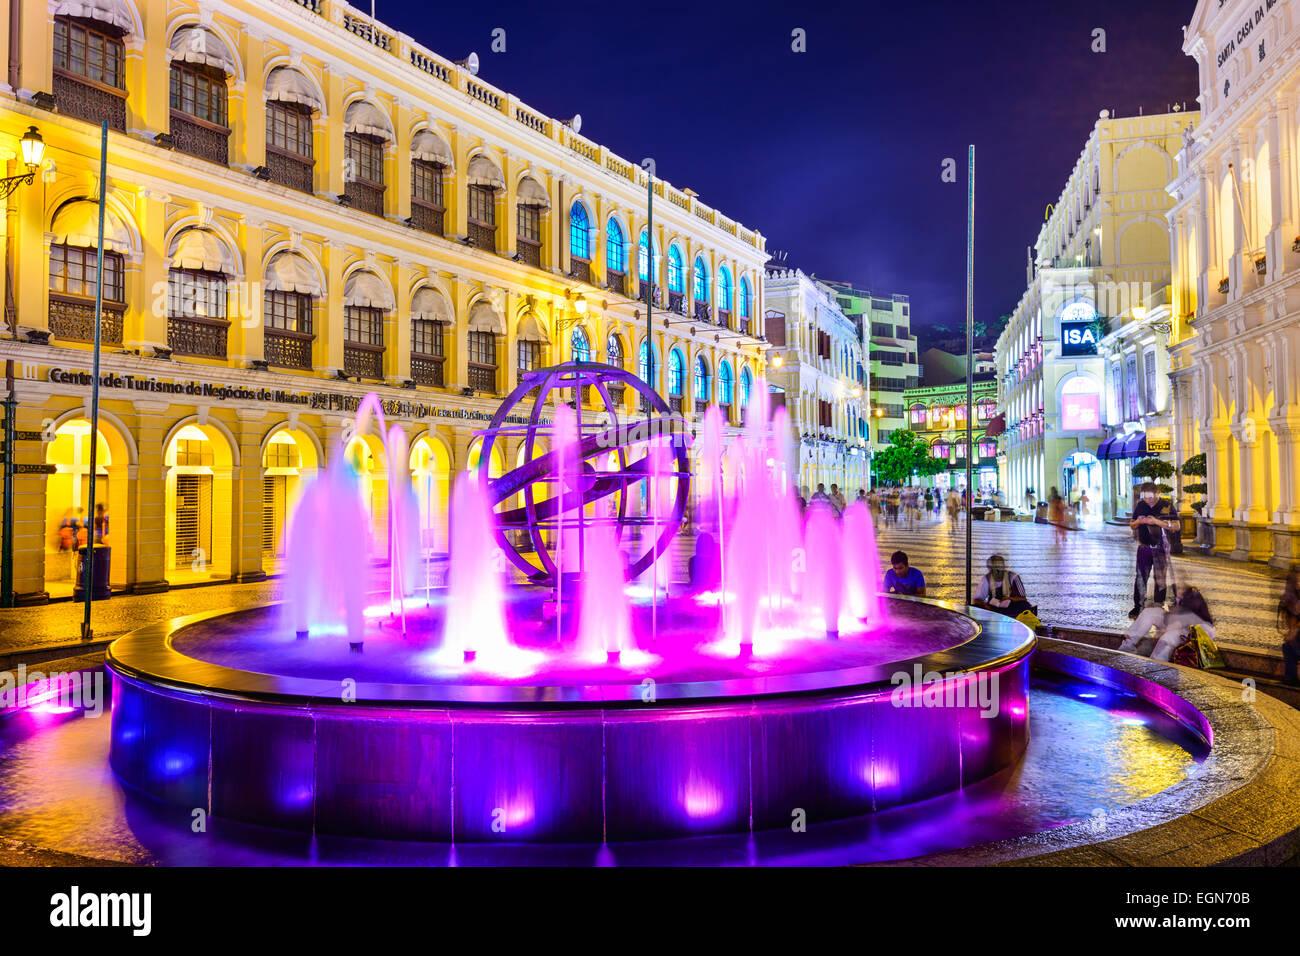 People enjoy Senado Square in Macau, China. - Stock Image